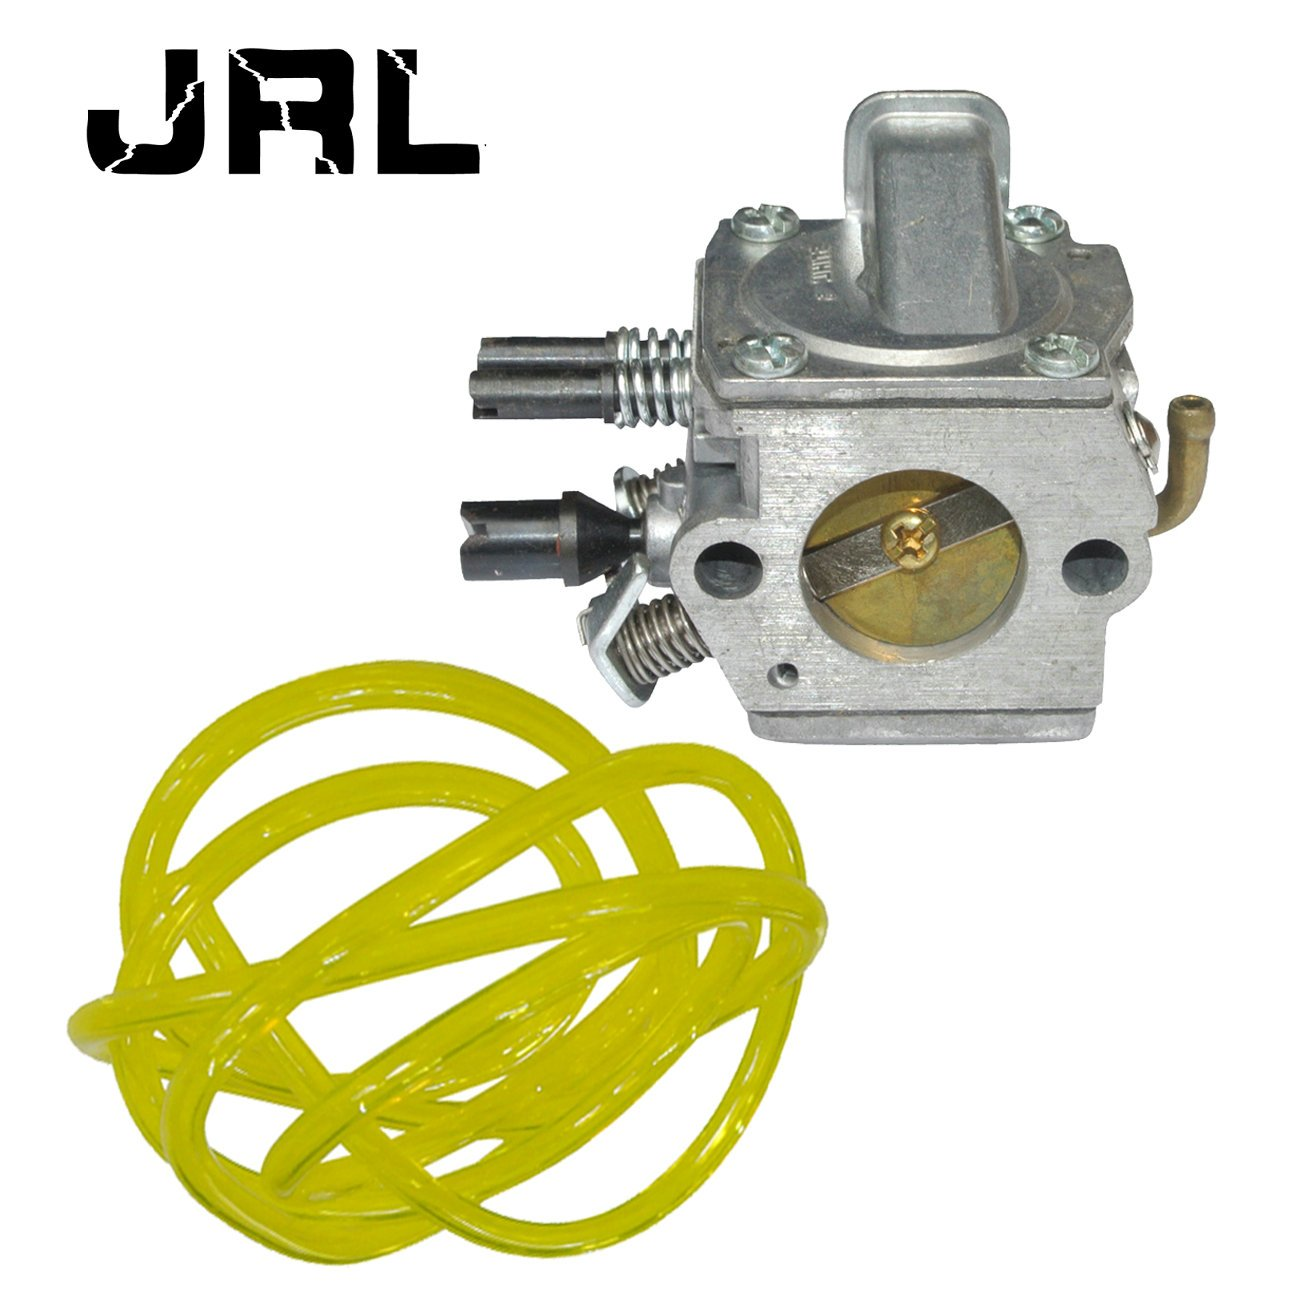 jrl carburador Carb con l/ínea de combustible para STIHL 034/036/MS340/MS360/Zama c3/a-s31